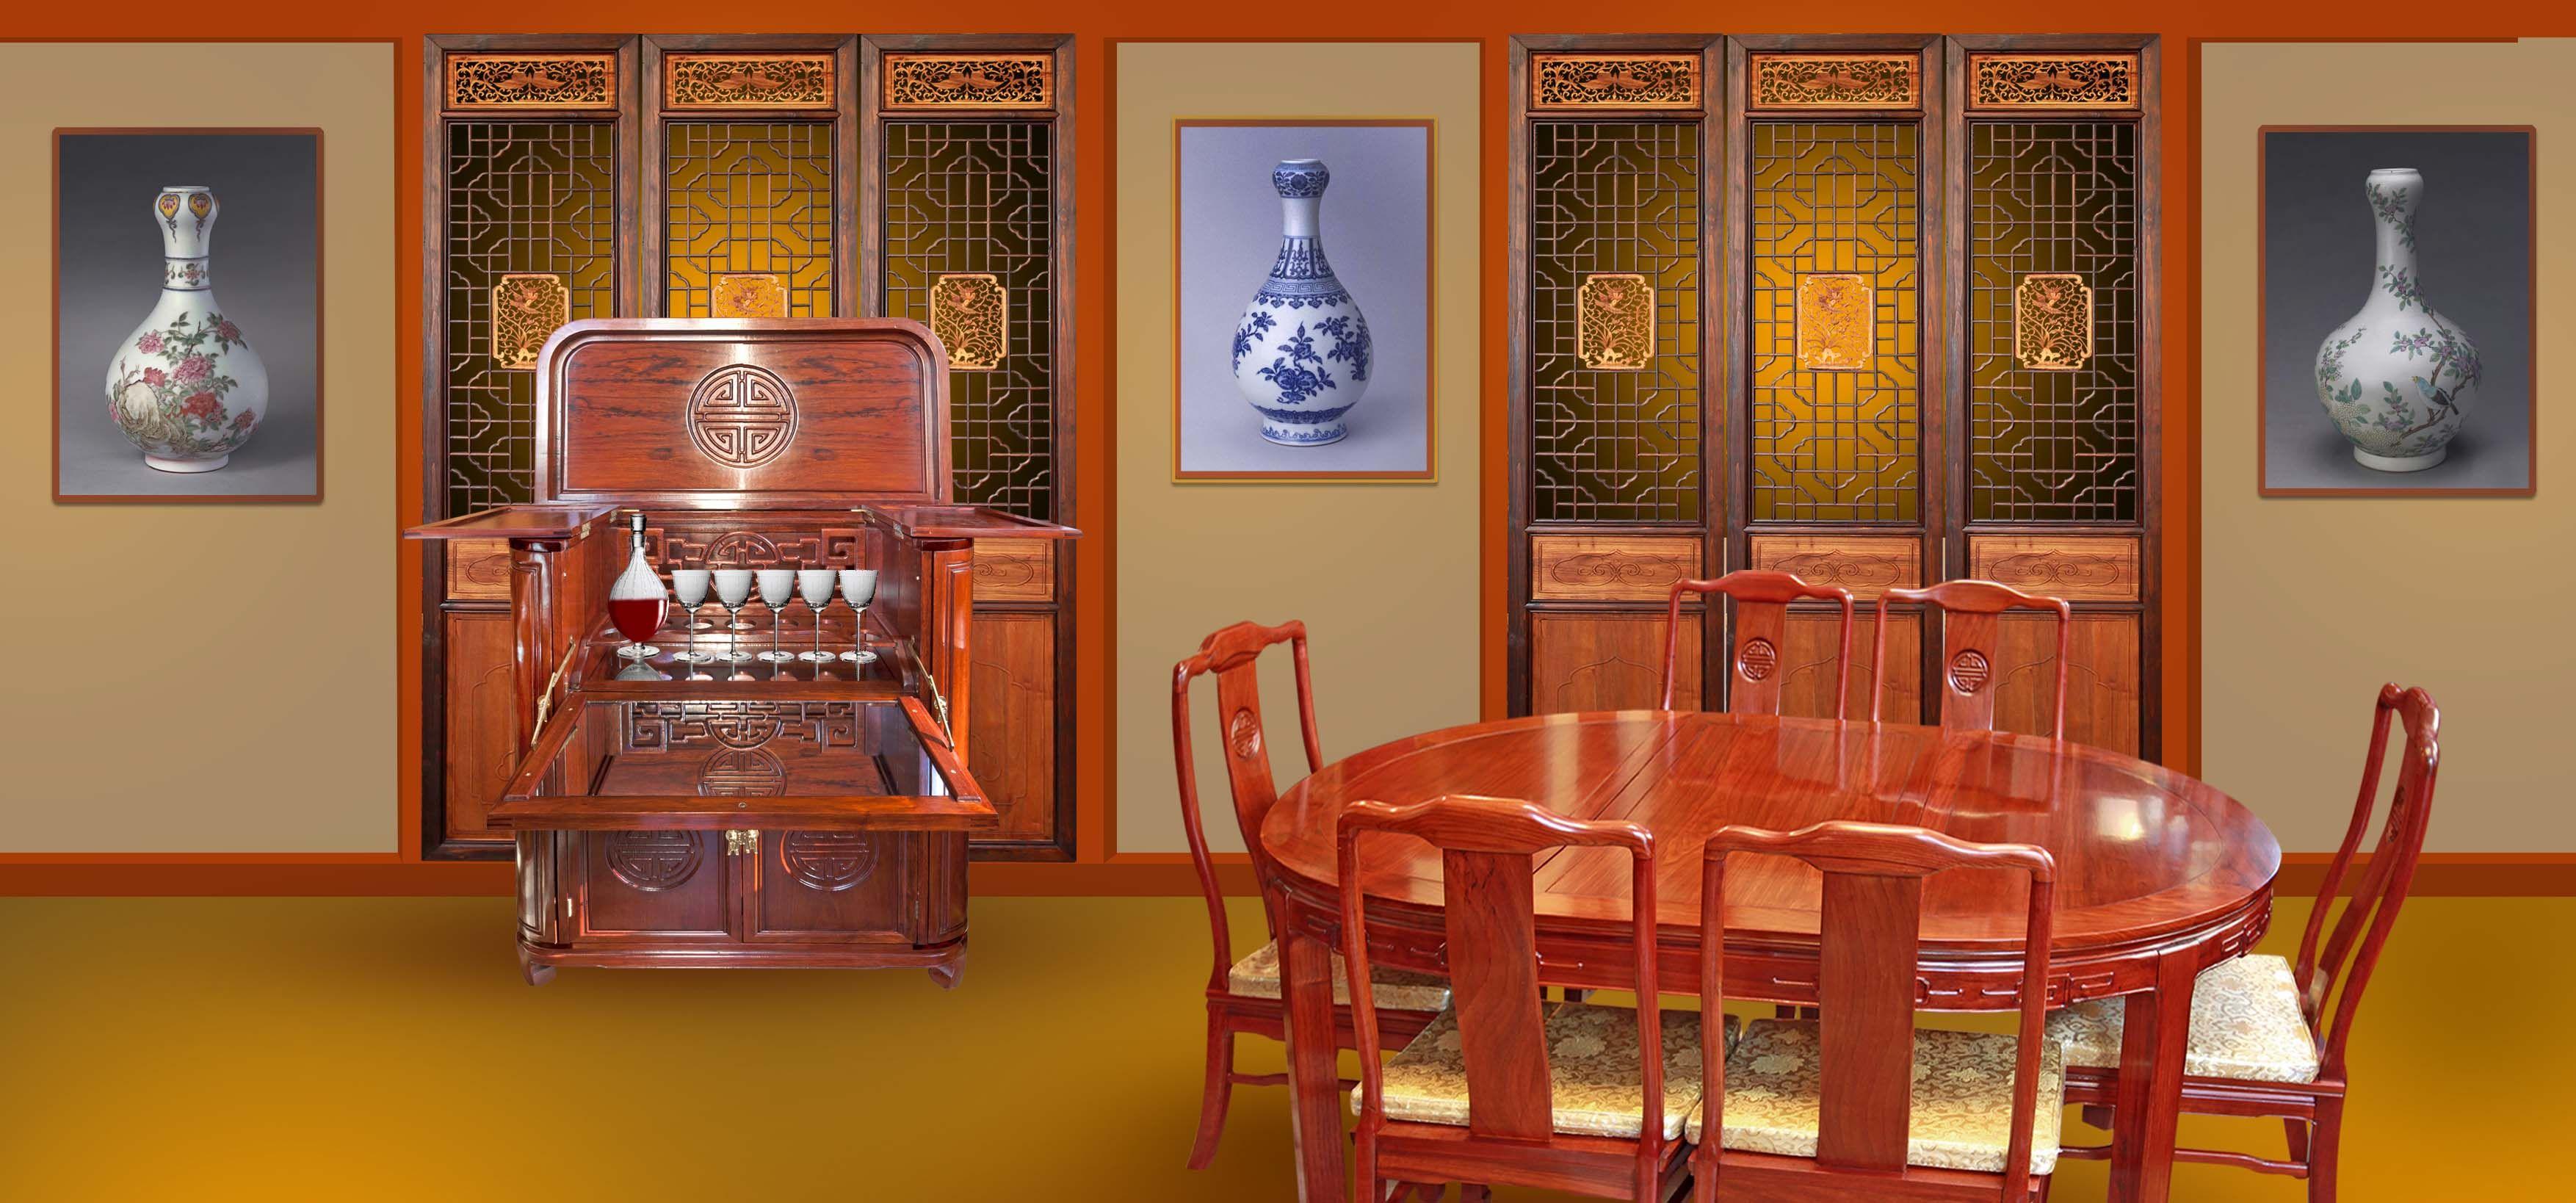 Bar Et Table Manger Meuble Dynasty Ming Meuble Meuble Chinois Mobilier De Salon